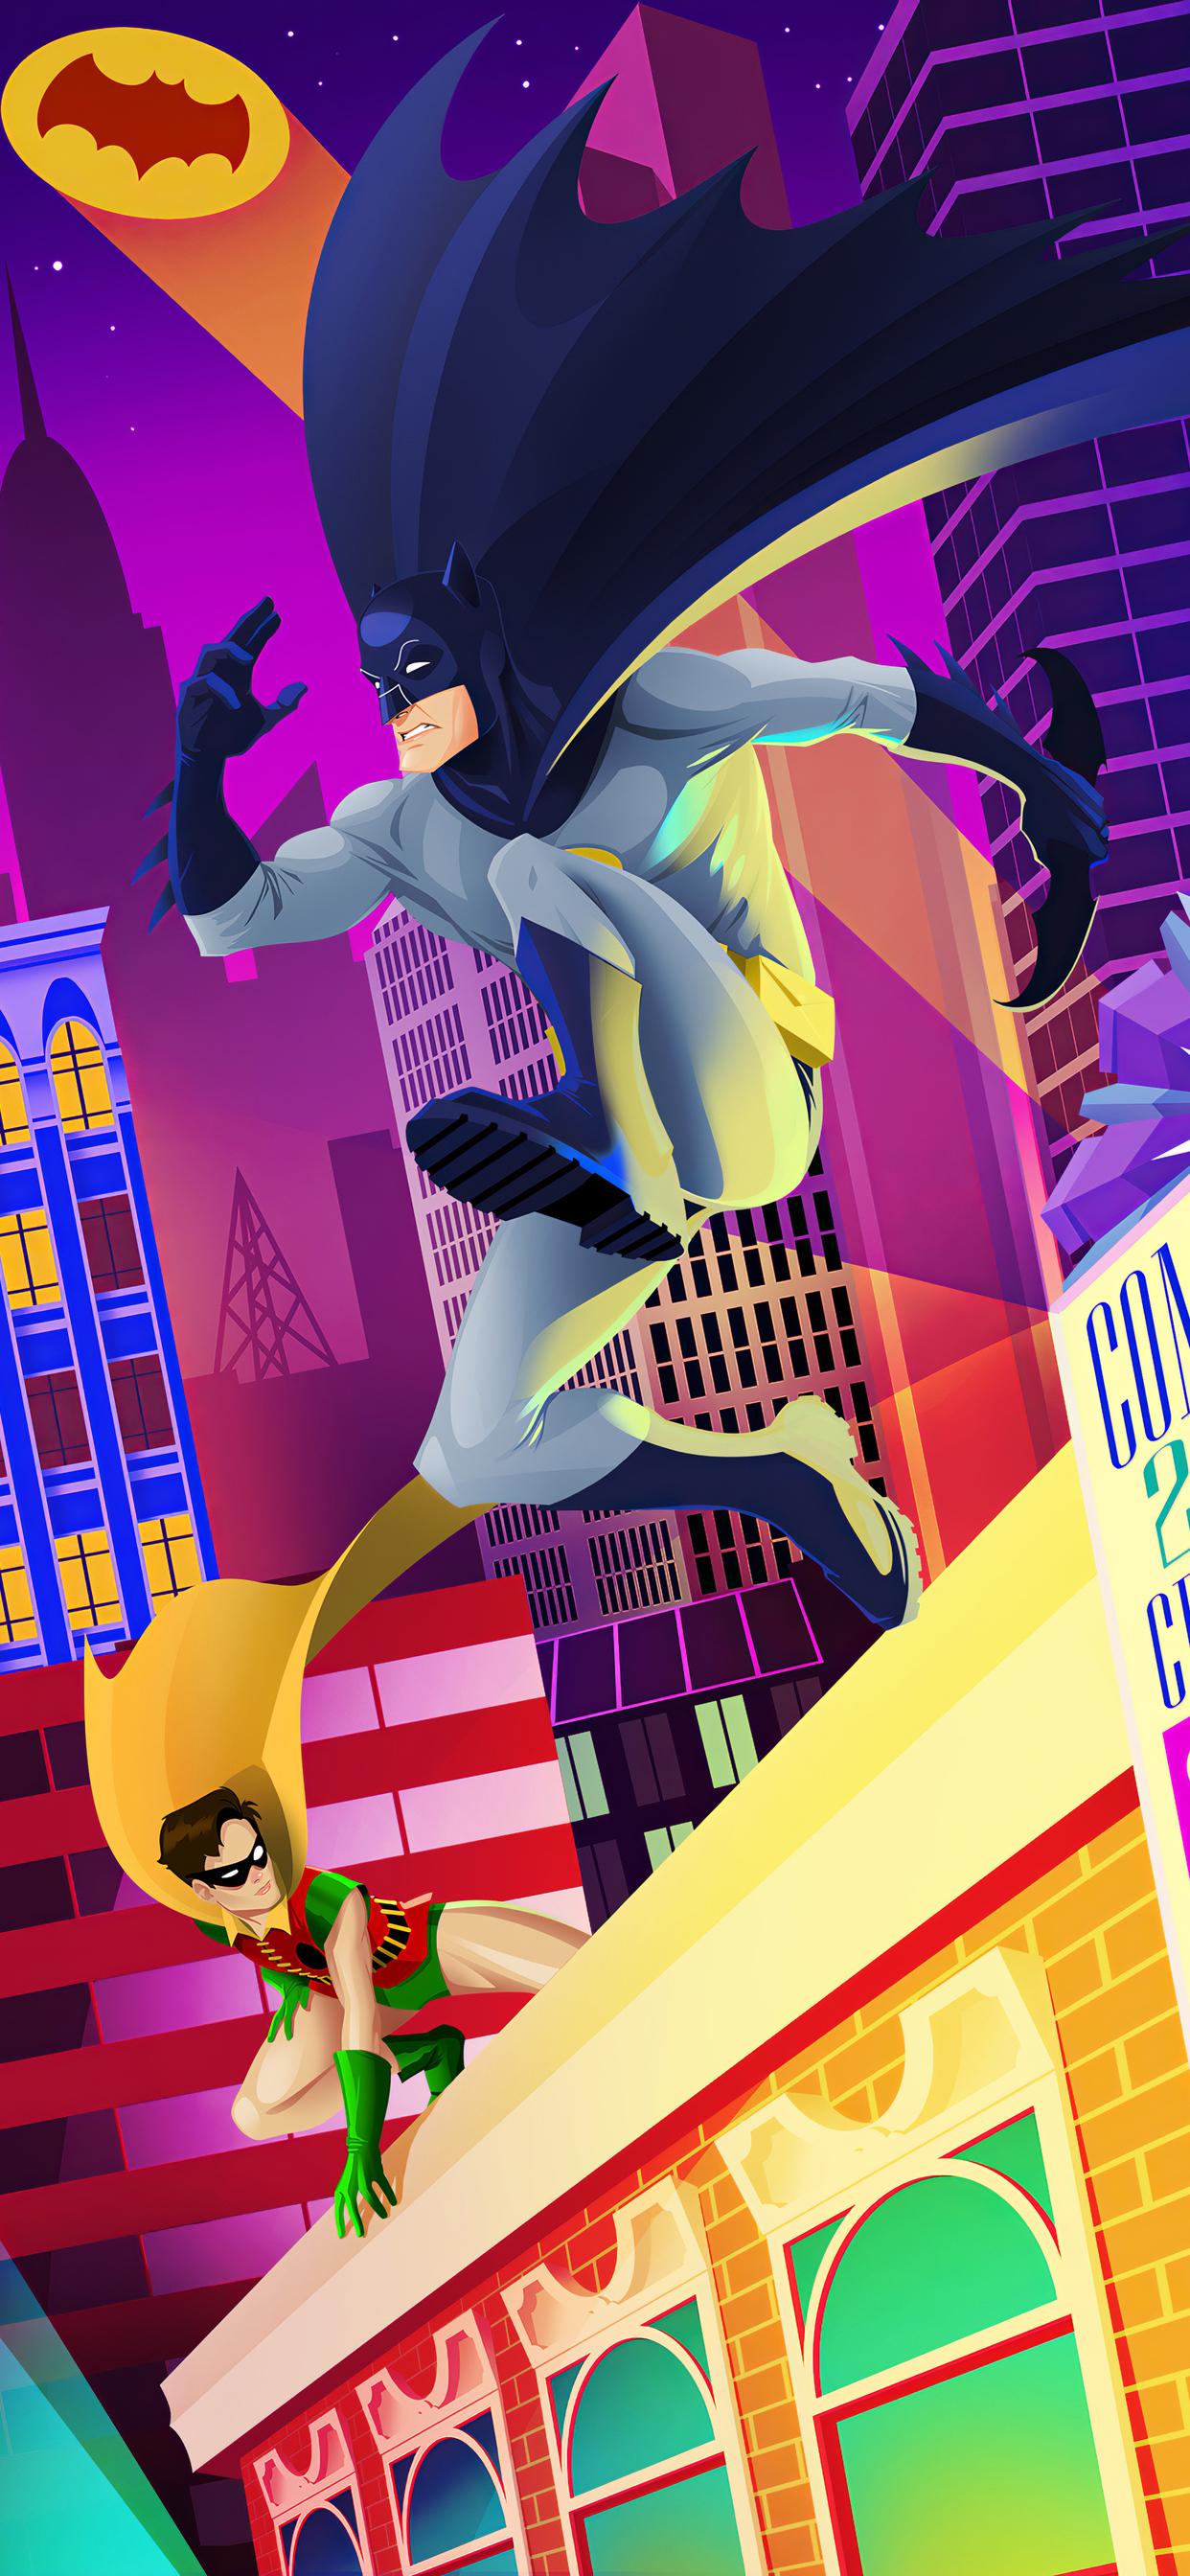 batman-comicon-4k-4s.jpg